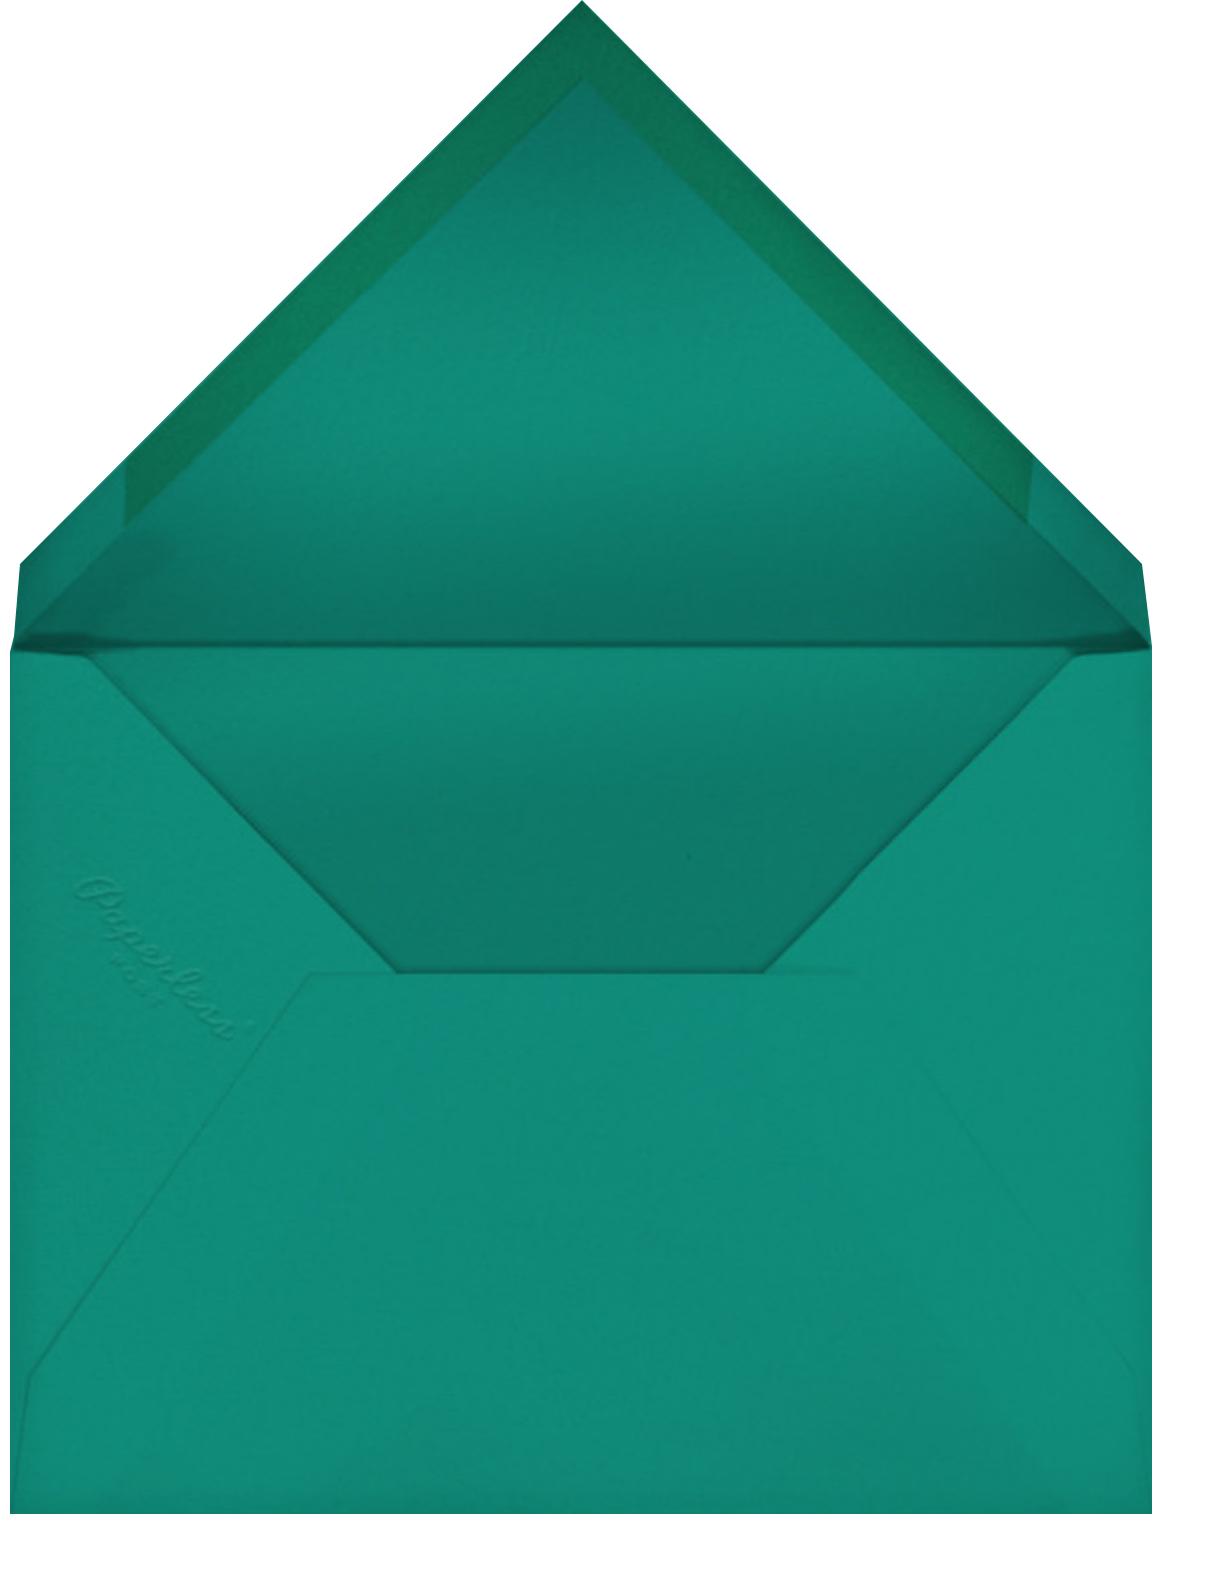 Mustard (Tall) - Paperless Post - Envelope